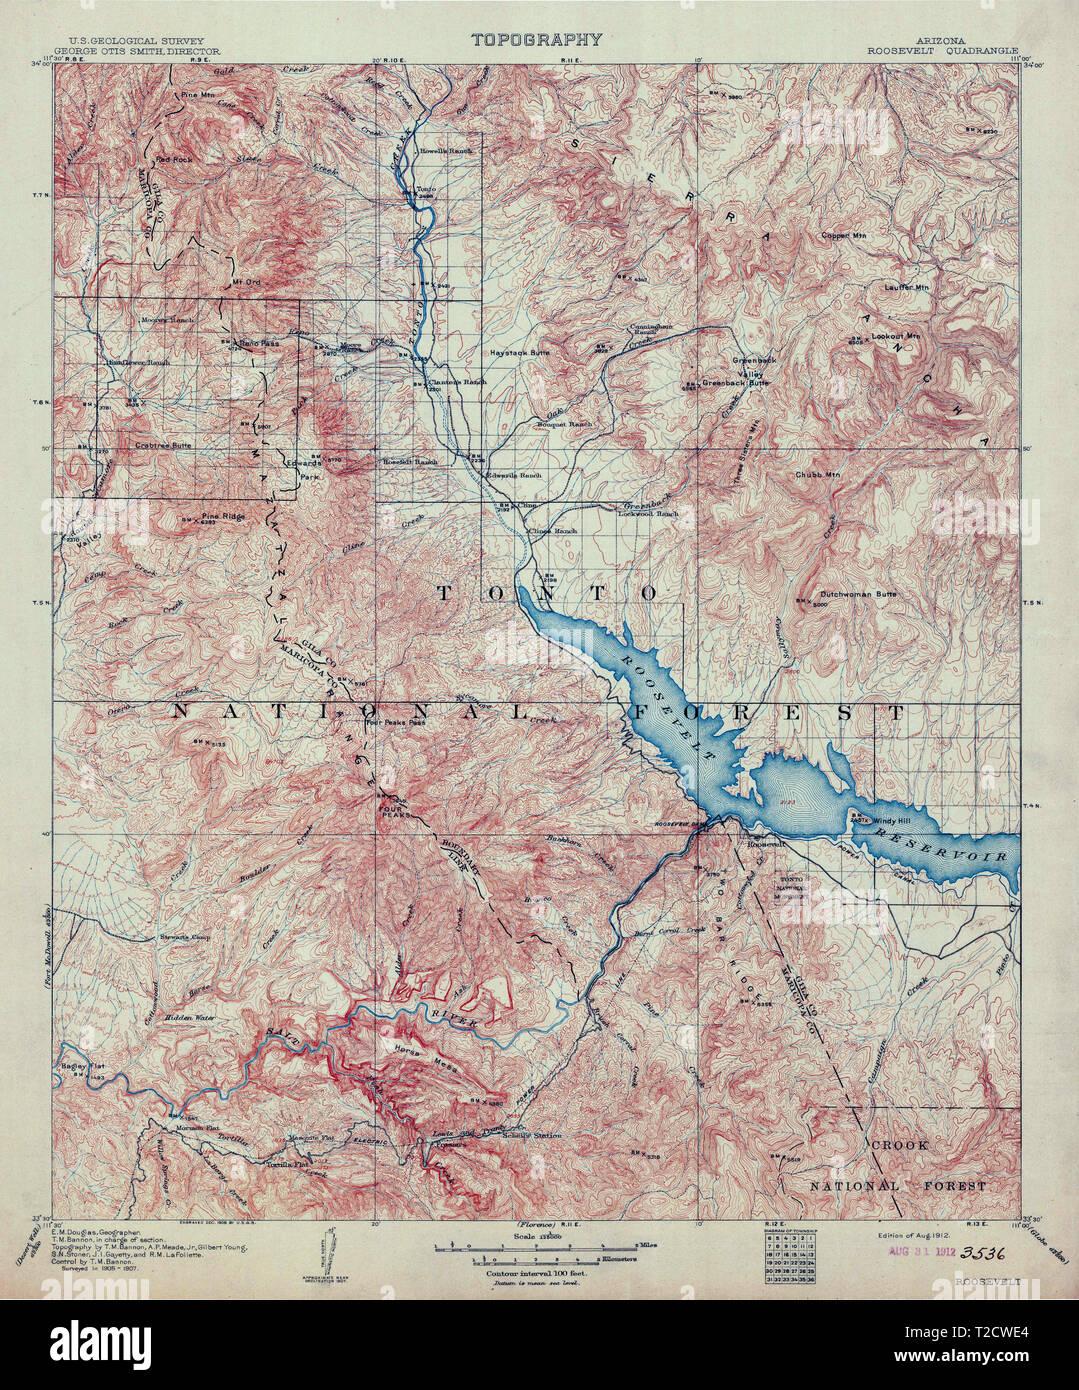 Topo Map Of Arizona.Usgs Topo Map Arizona Az Roosevelt 315403 1912 125000 Restoration